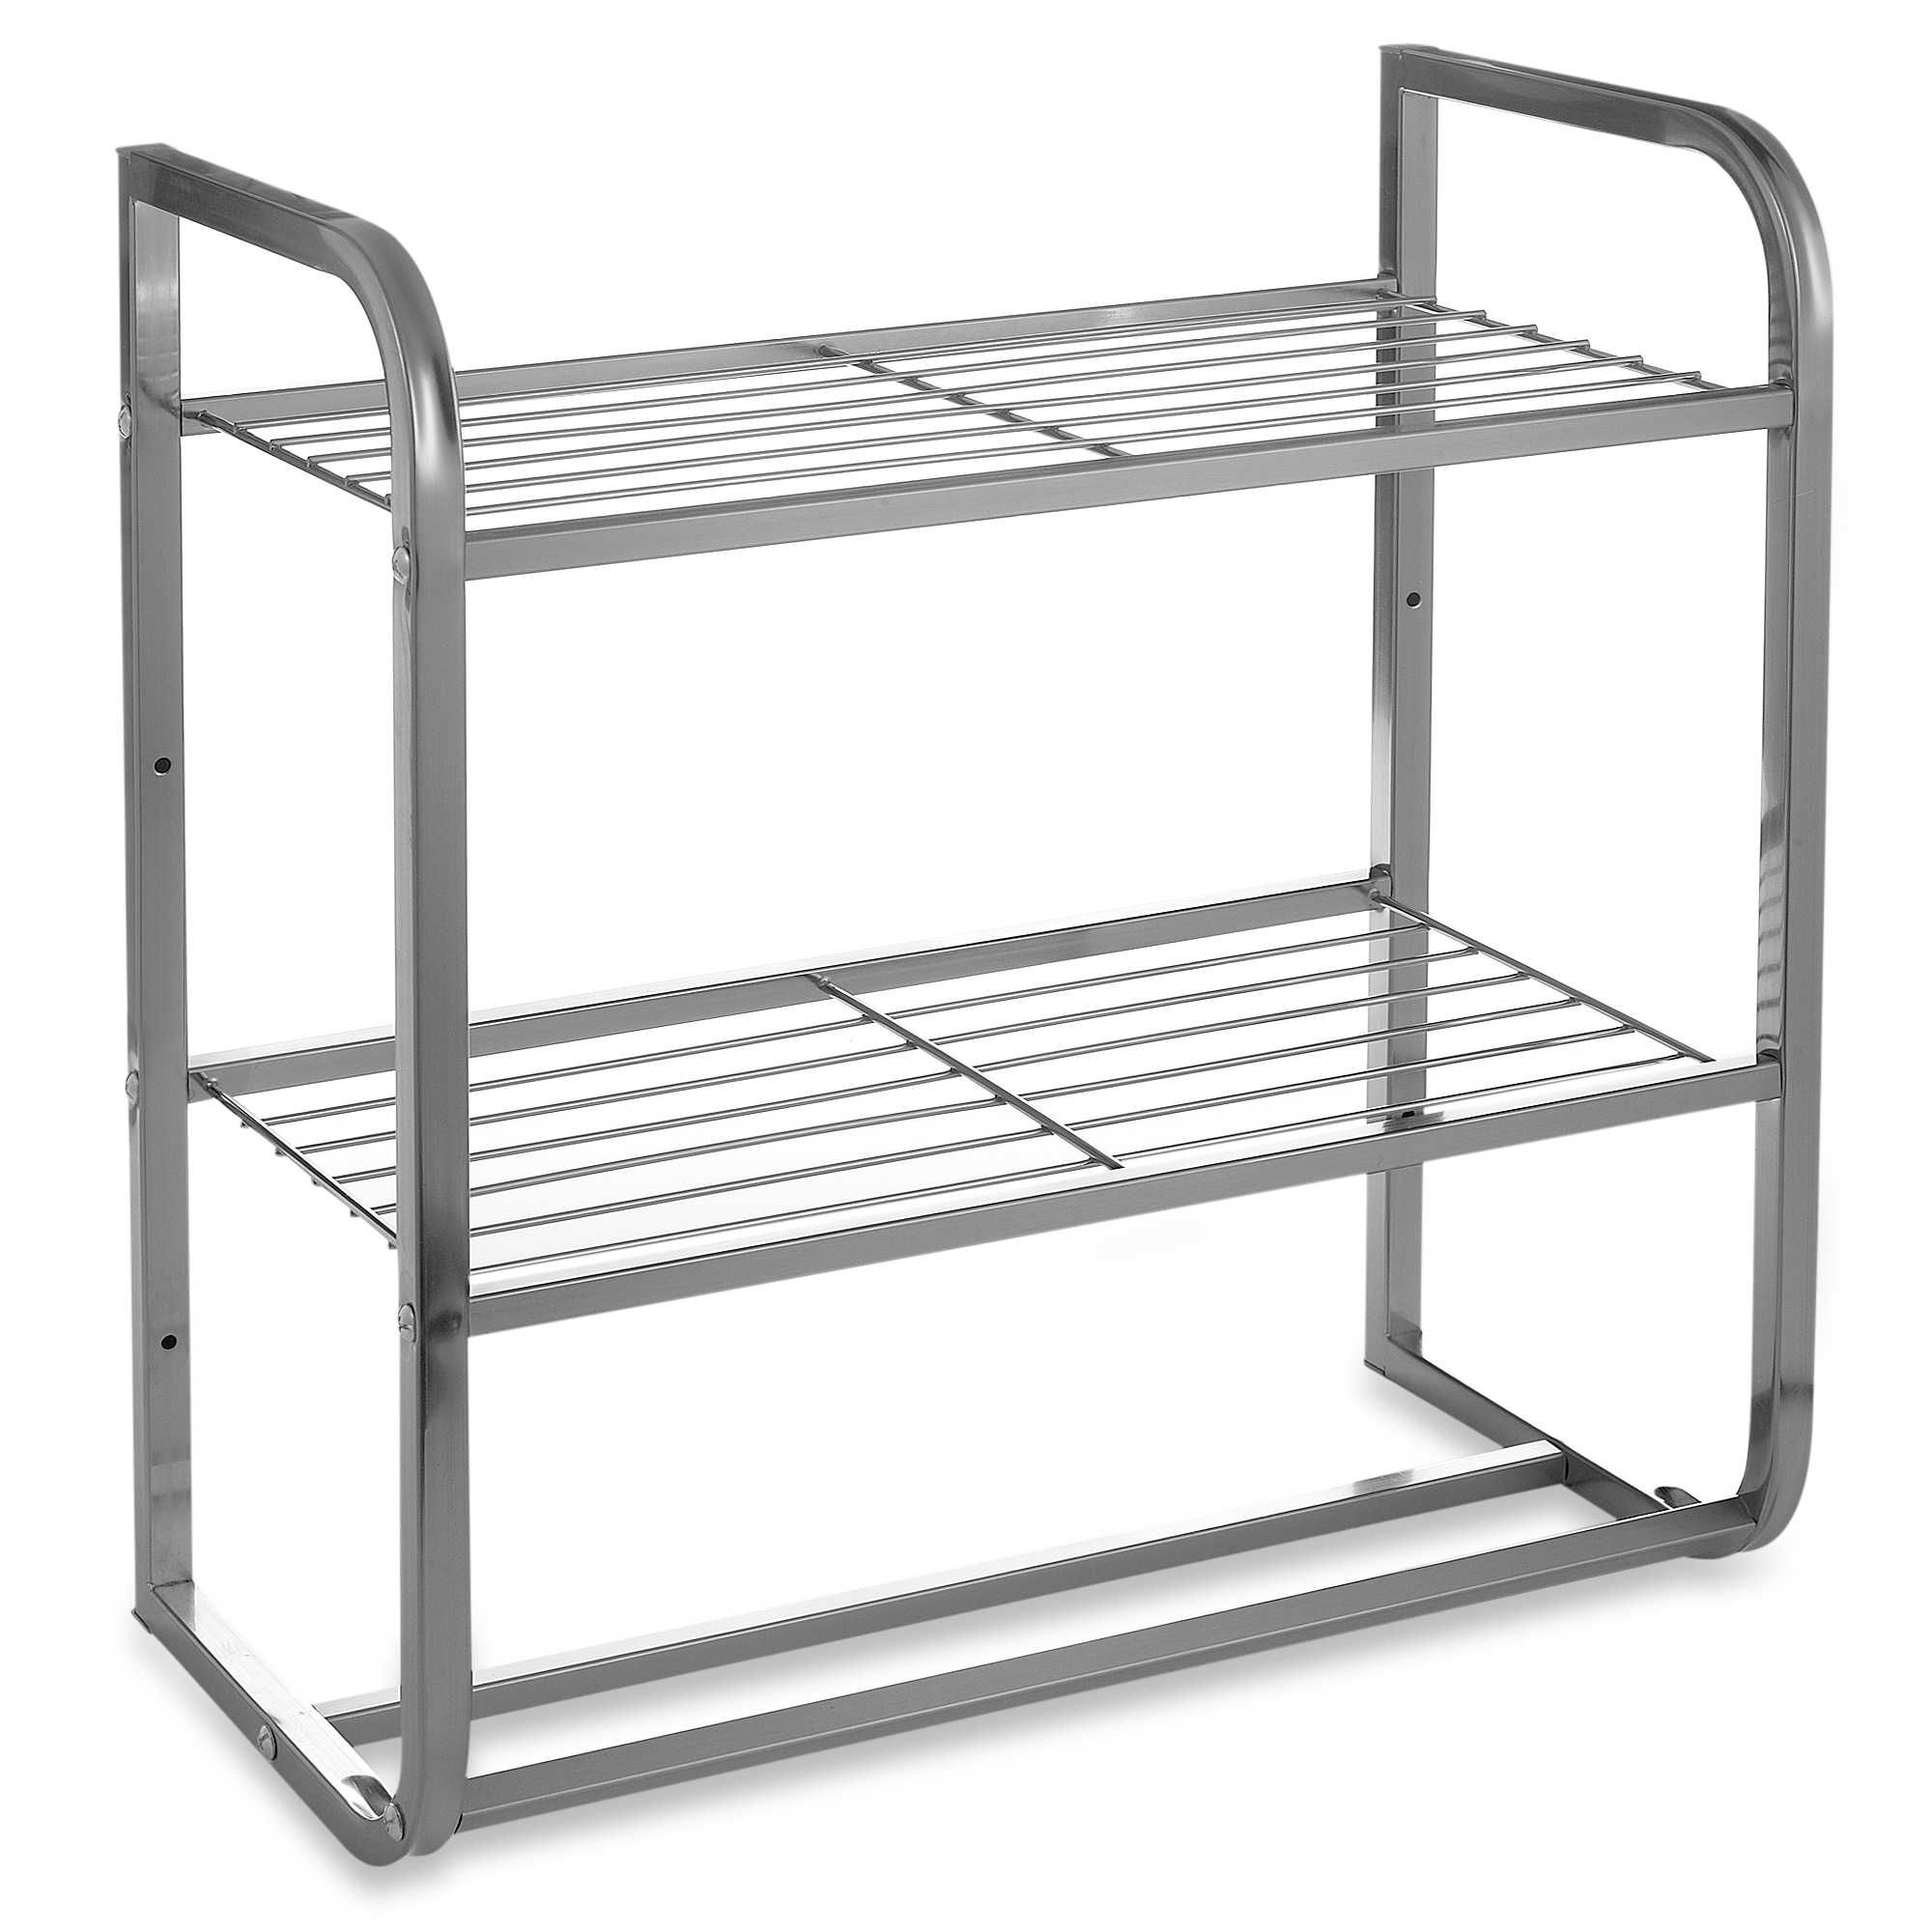 2 Tier Satin Nickel Shelf With Towel Bars